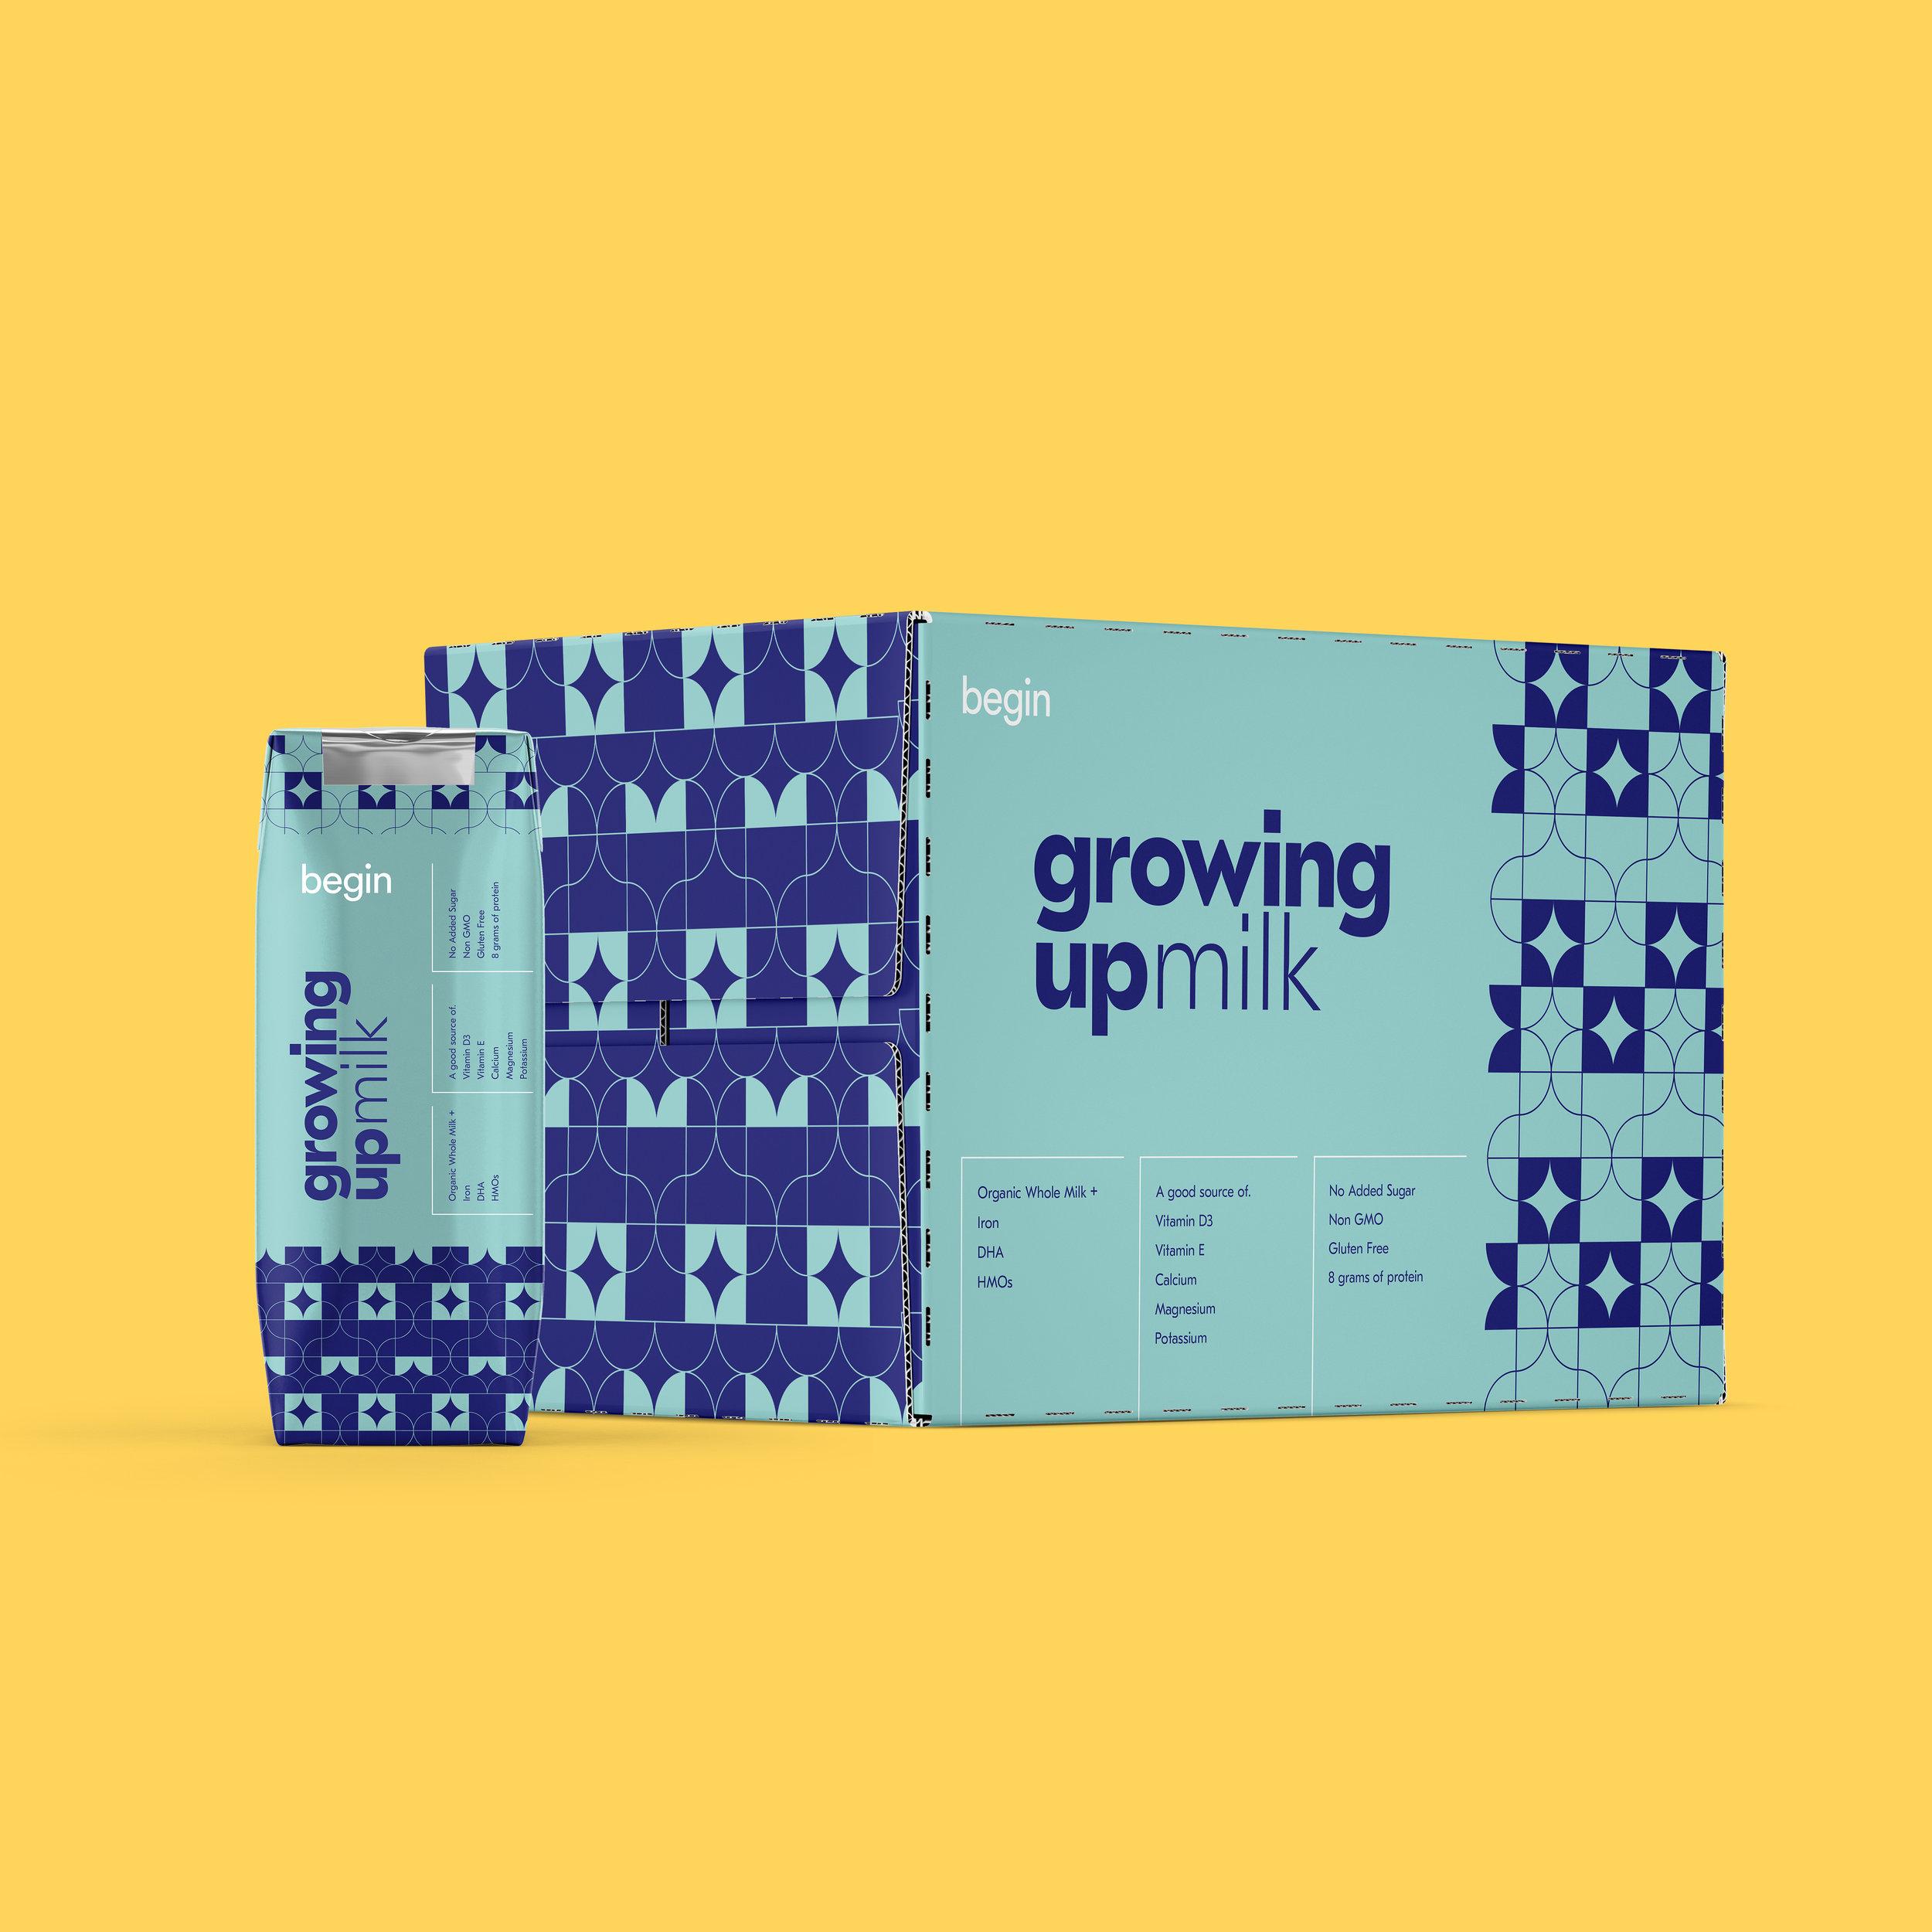 BGN-Growing_Up_Milk.jpg